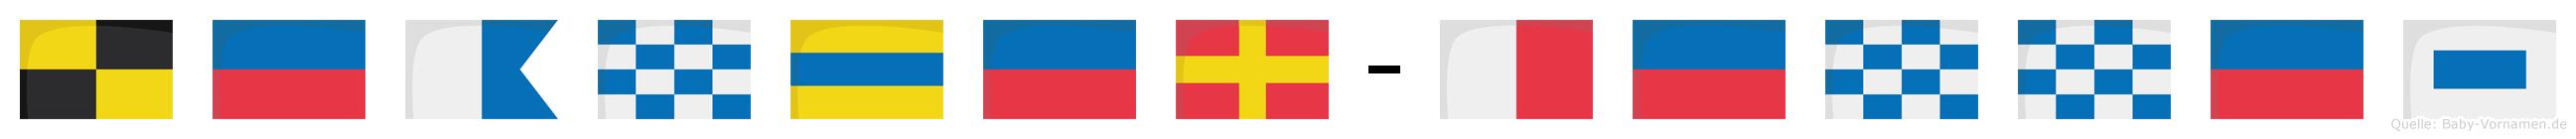 Leander-Hennes im Flaggenalphabet